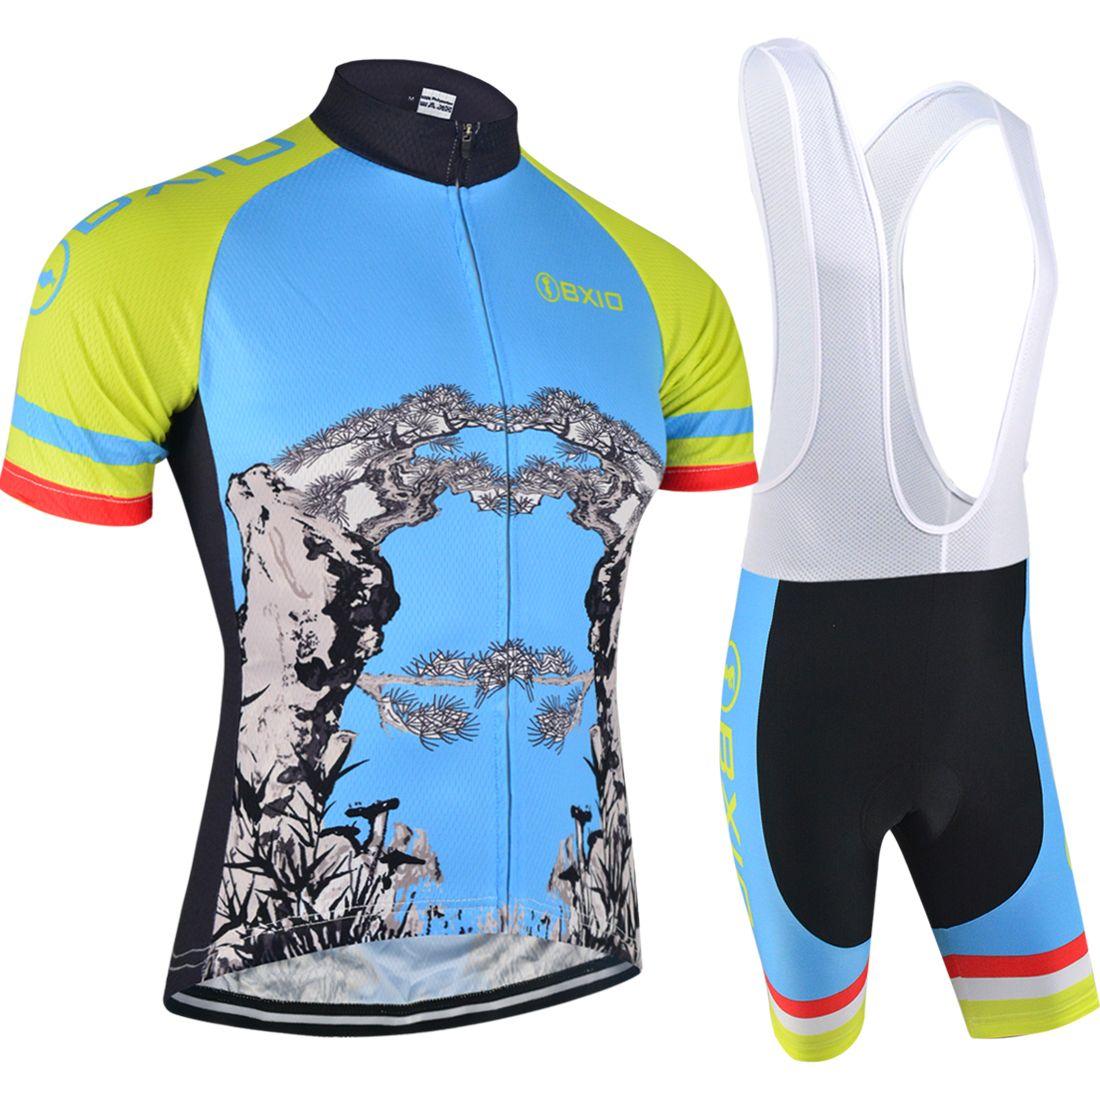 BXIO Brand Summer Type New Cycling Set Bike Outdoor Sport Wear ... 9126f83ec